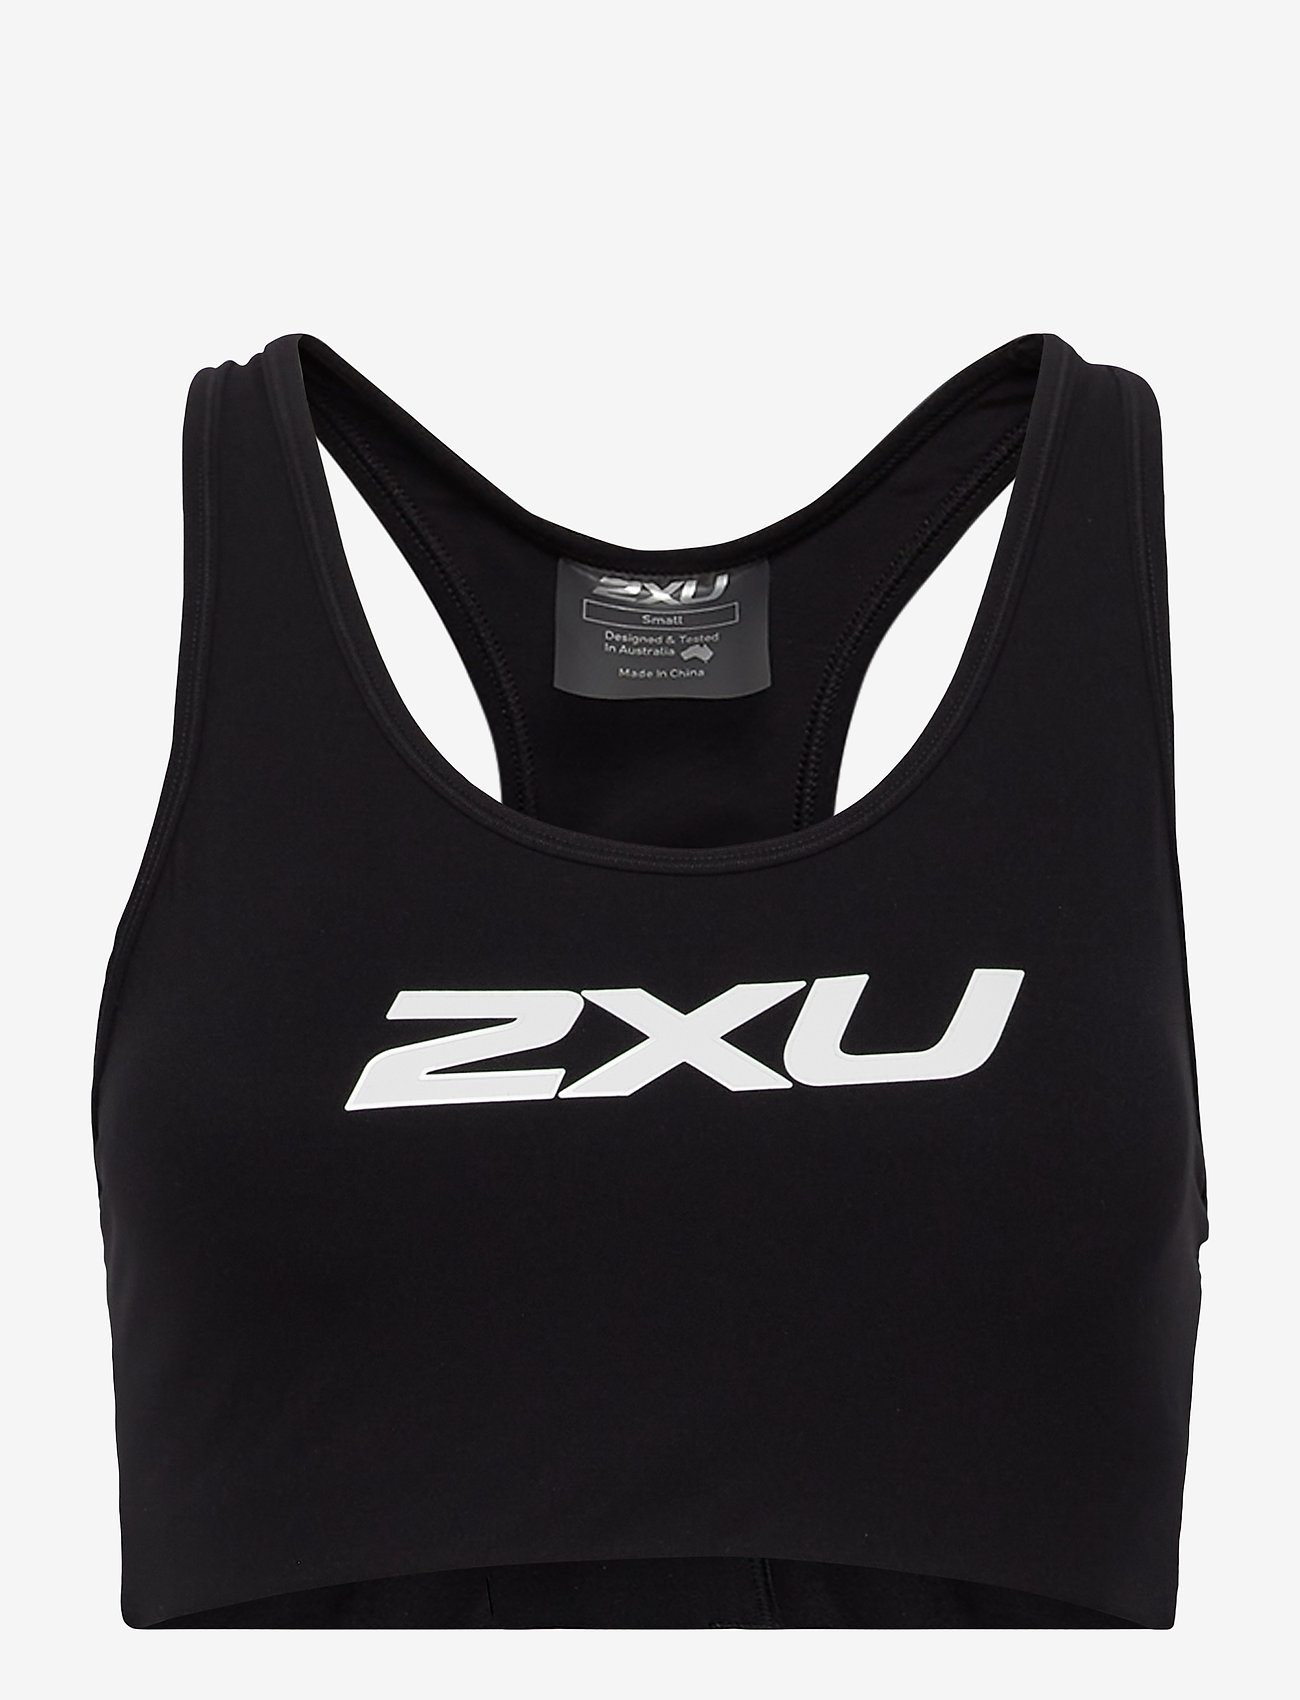 2XU - MOTION RACERBACK CROP - sport bras: medium - black/white - 0